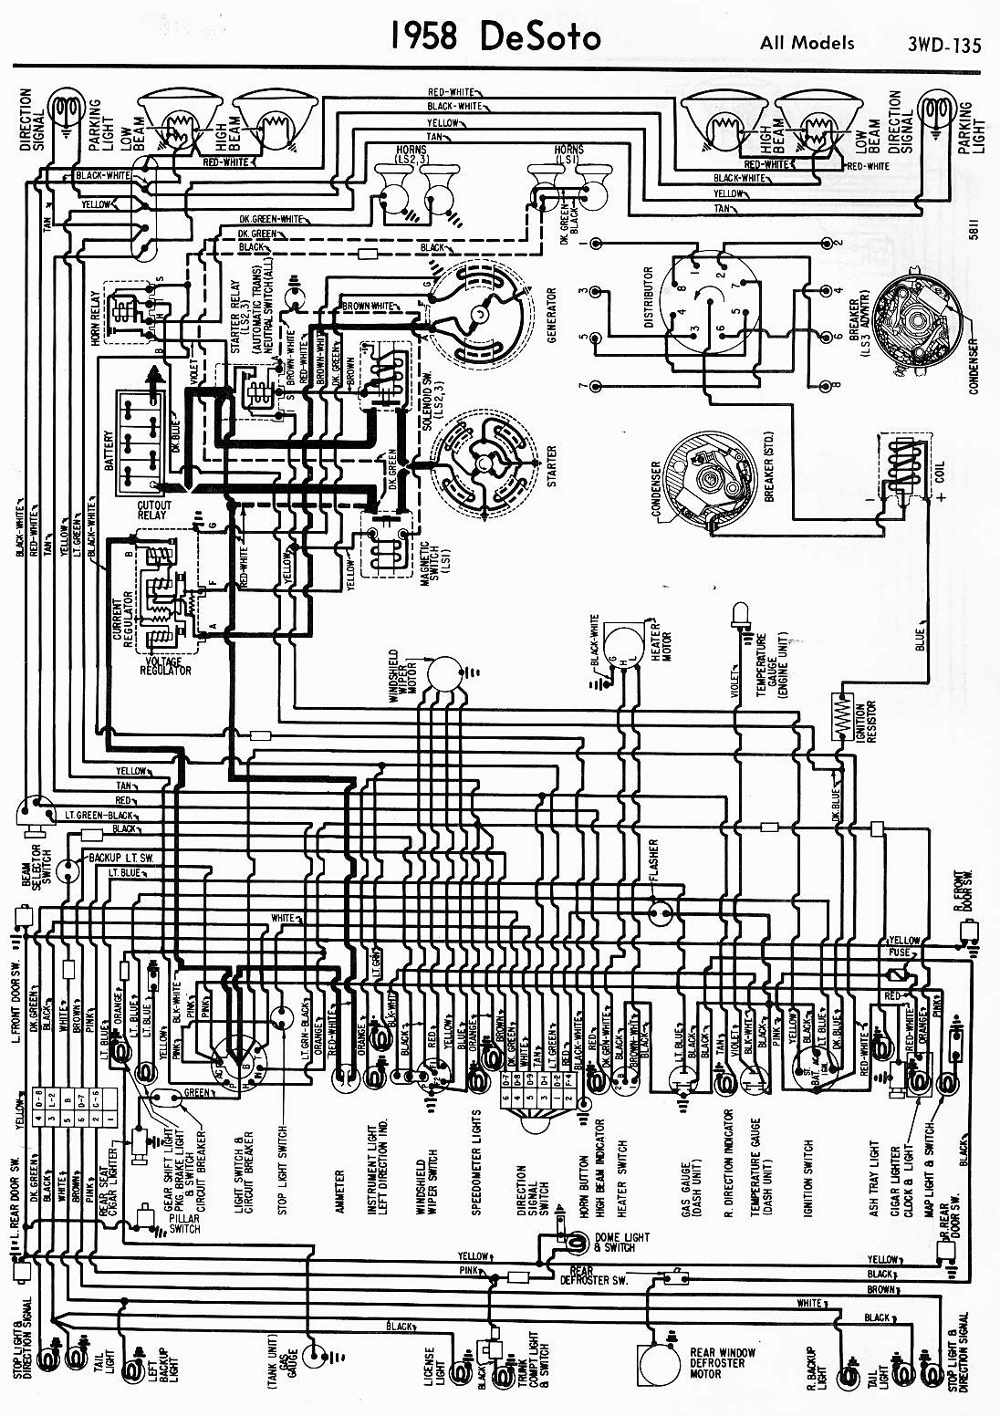 Mahindra Starter Wiring Diagram | Wiring Diagram on mahindra joystick control valves, mahindra tractor parts diagram, mahindra 4025 tractor wiring diagram, mahindra 6530 tractor data, 445 ford tractor pto diagram, mahindra tractor schematic, tractor hydraulic system diagram, ford tractor power steering diagram, mahindra tractor battery replacements, mahindra power steering parts, ford tractor steering column diagram, mahindra tractor gear housing diagrams,